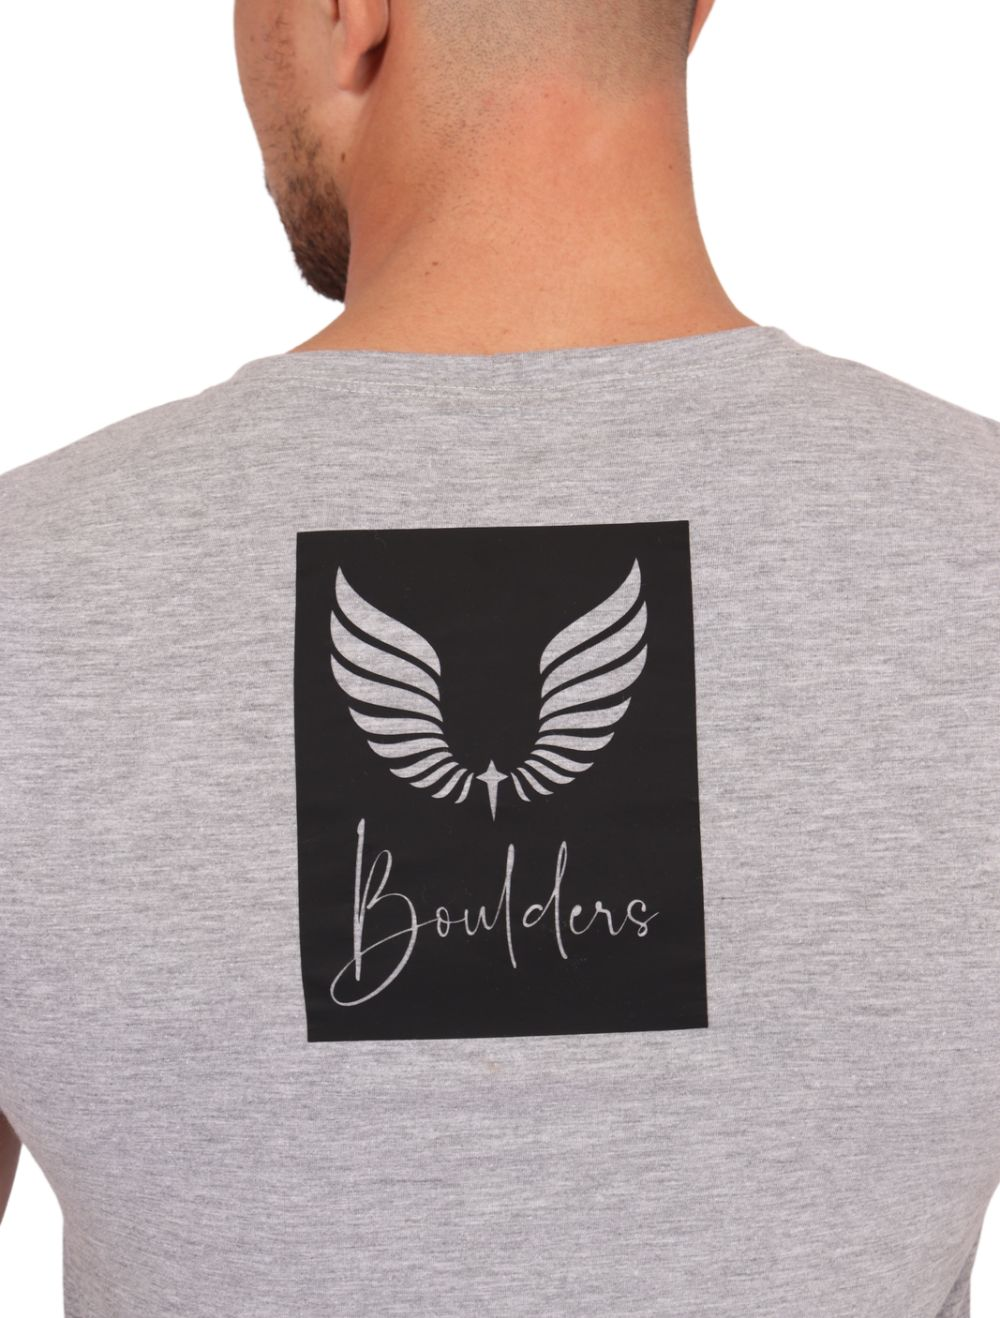 Camiseta Masculina Manga Curta Estampada Blessed